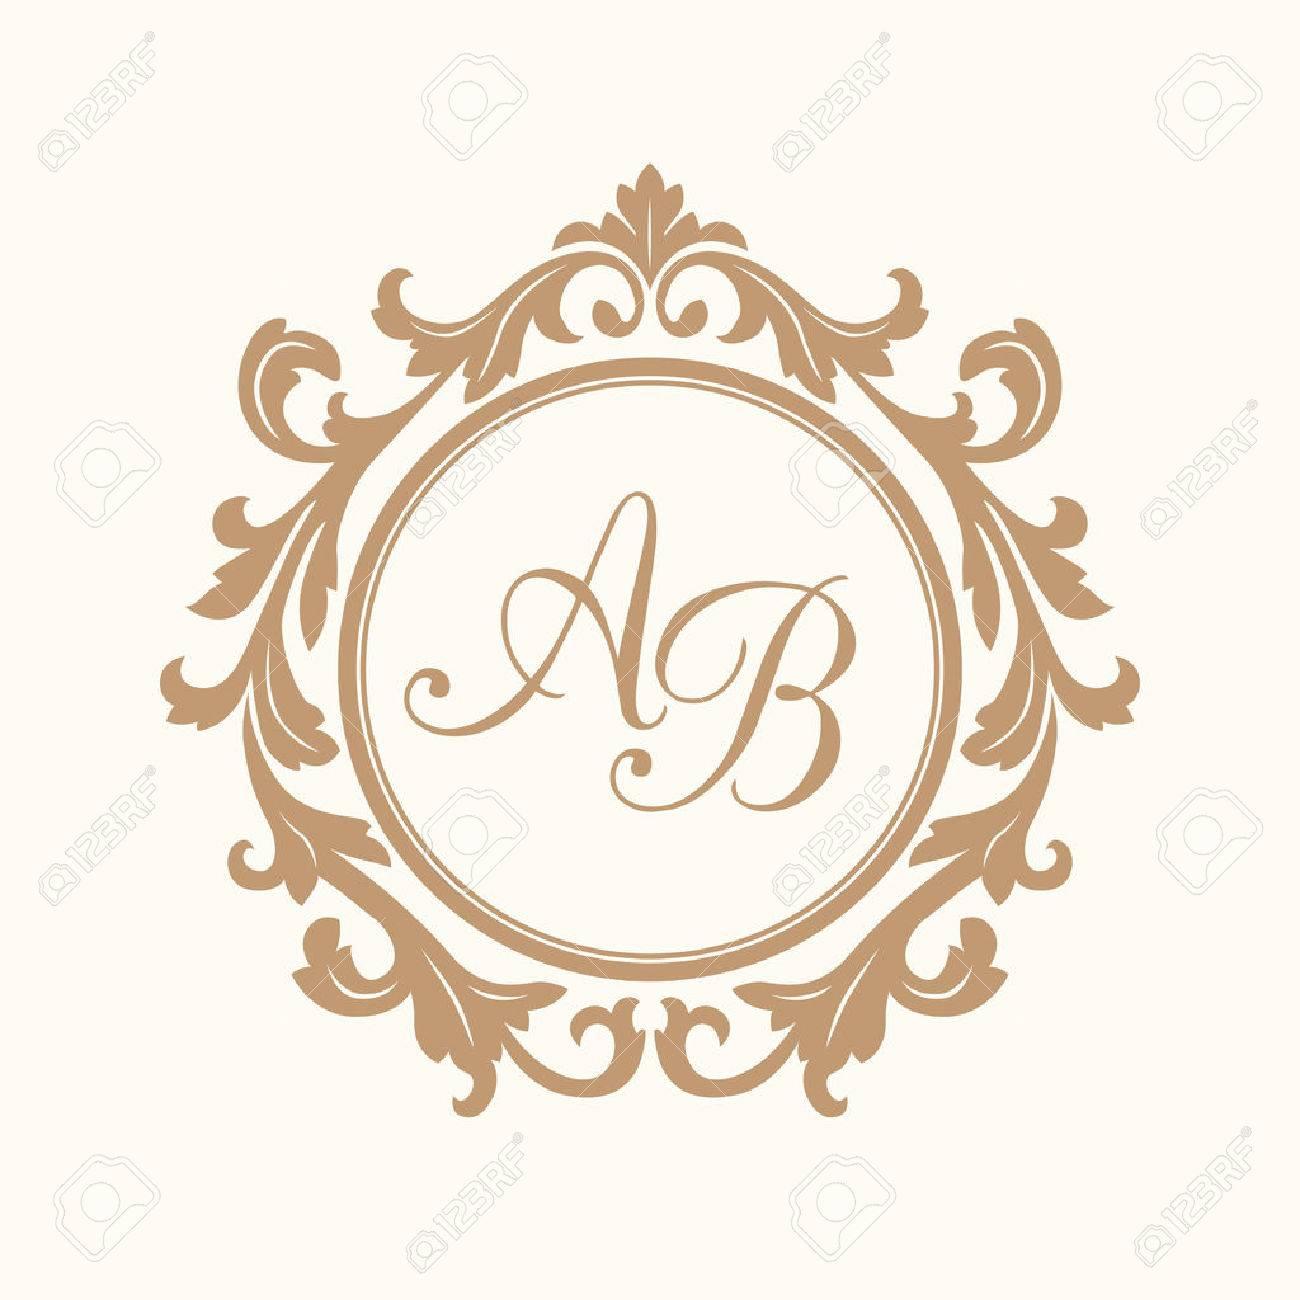 elegant floral monogram design template for one or two letters wedding monogram calligraphic elegant